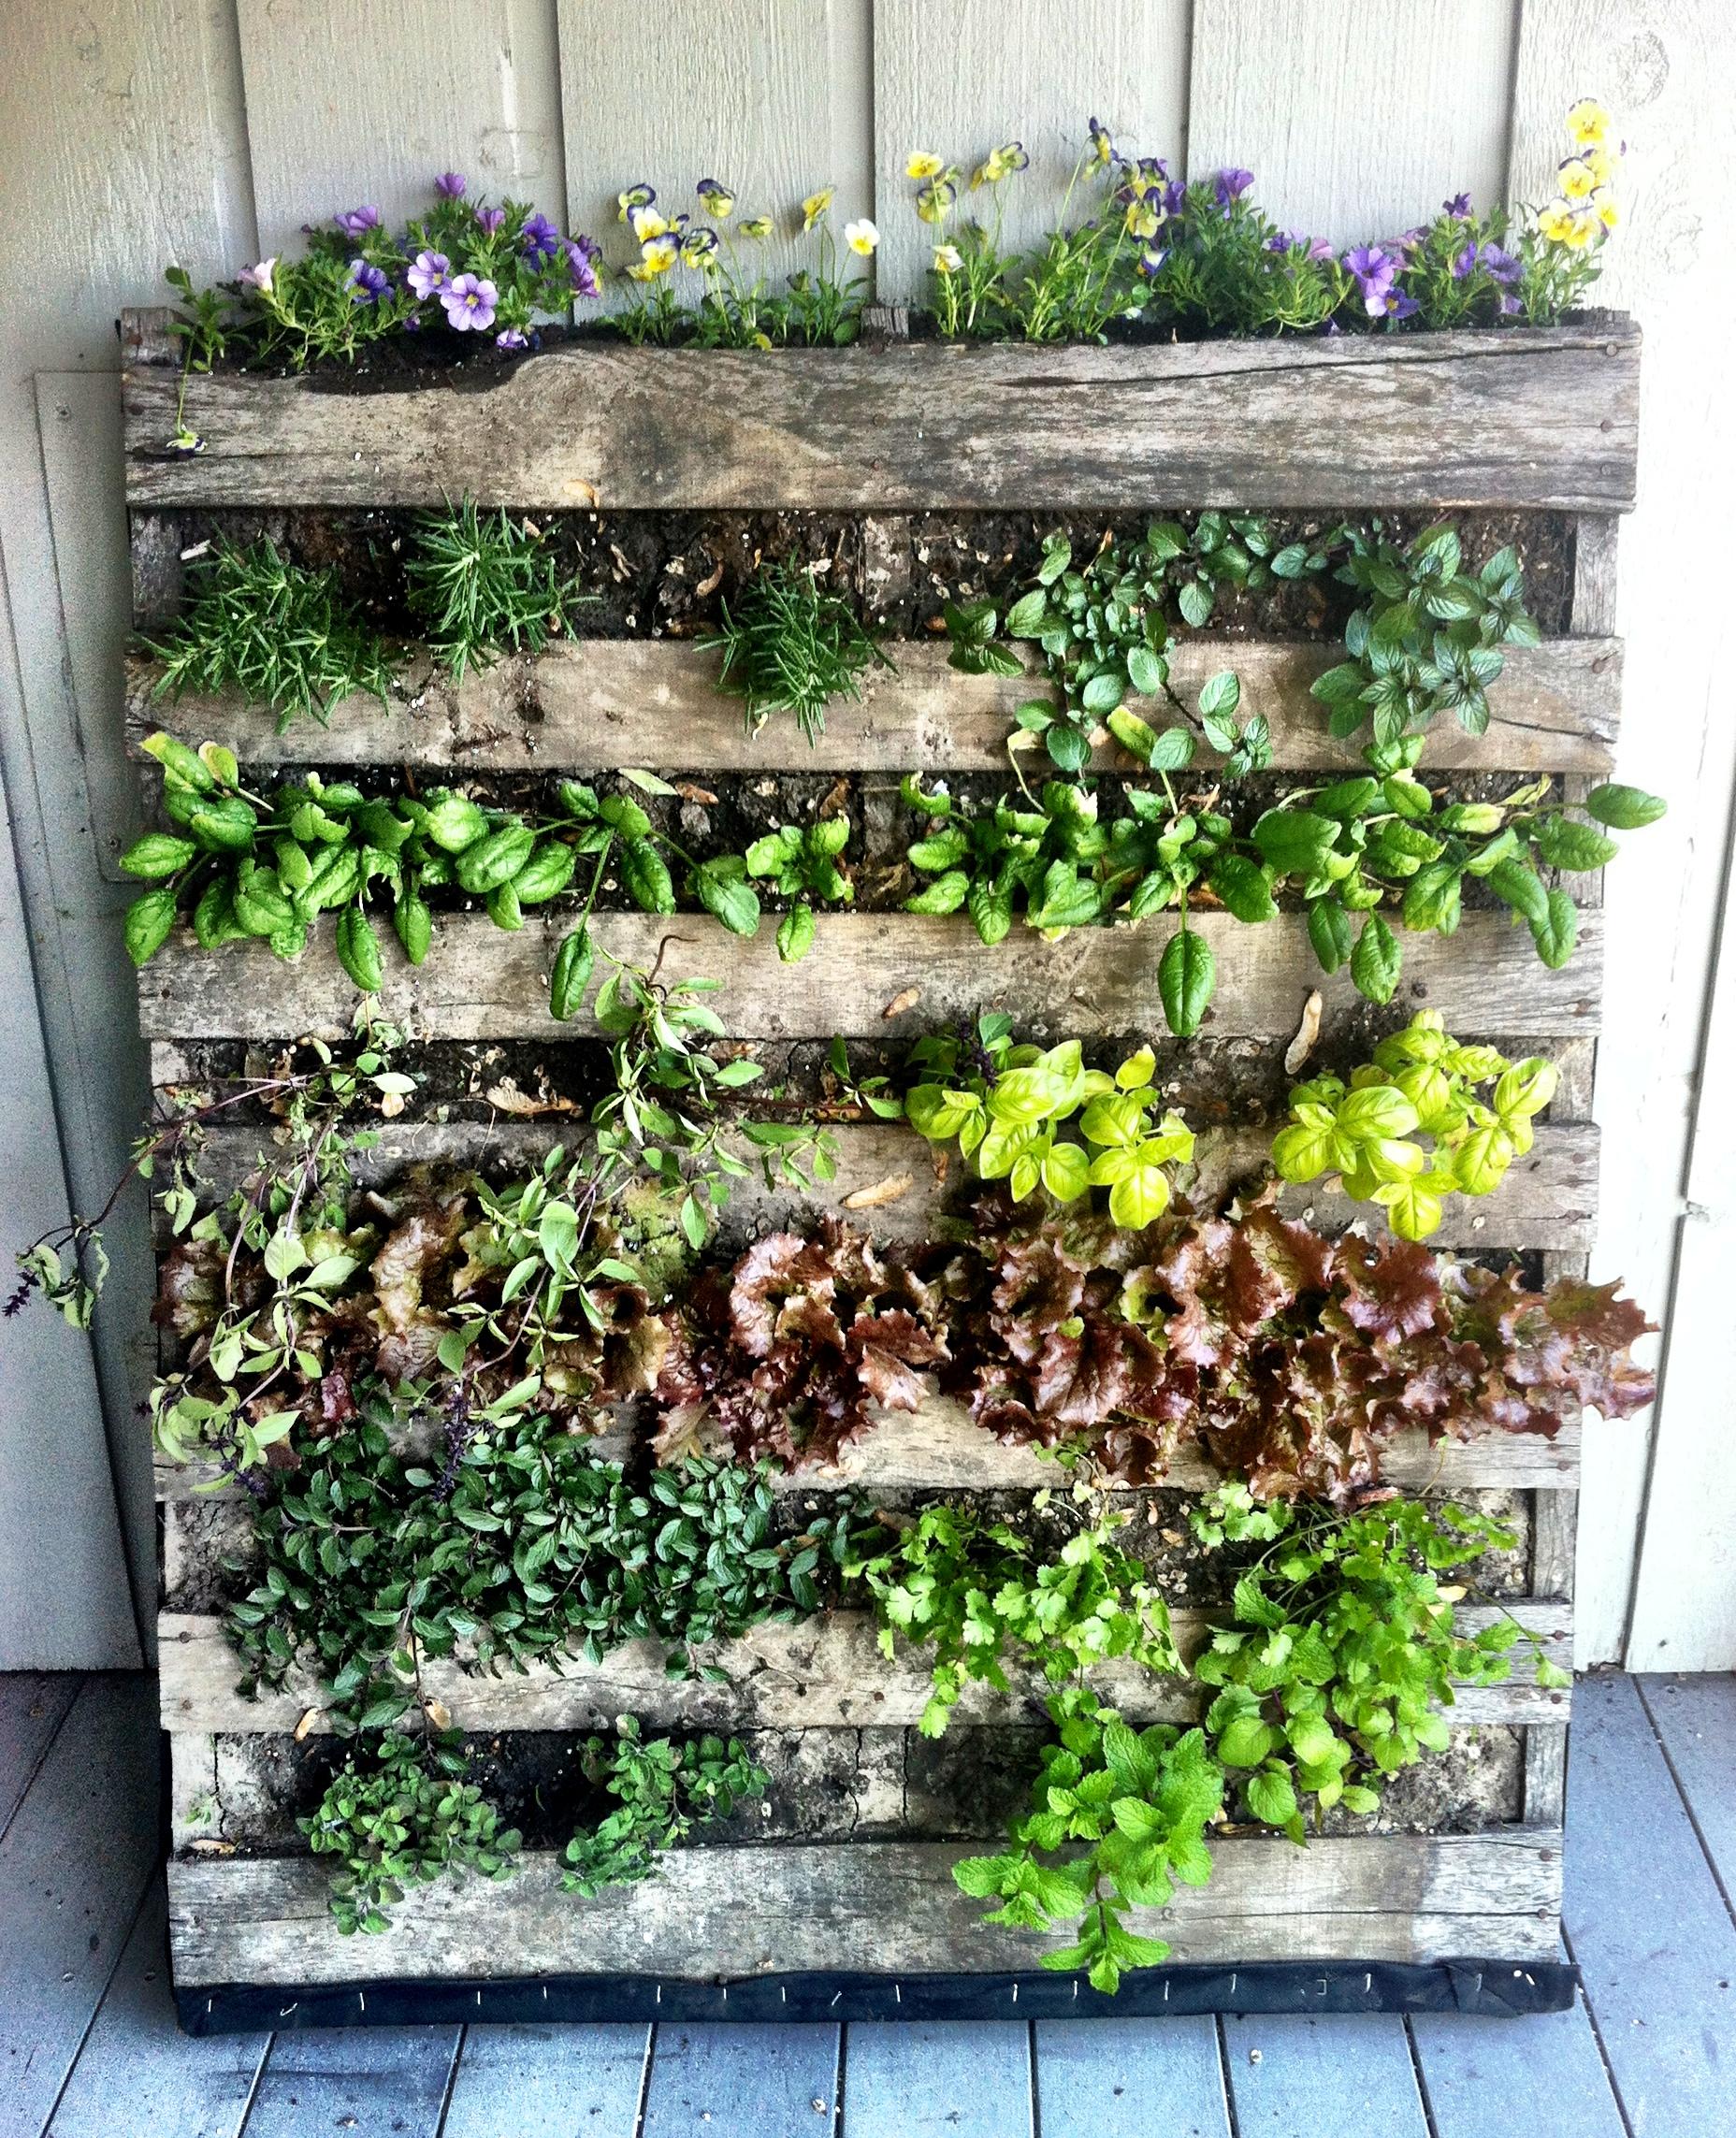 Vertical Kitchen Herb Garden 8 Trash Into Treasure Garden Diys Youve Got To Try Porch Advice